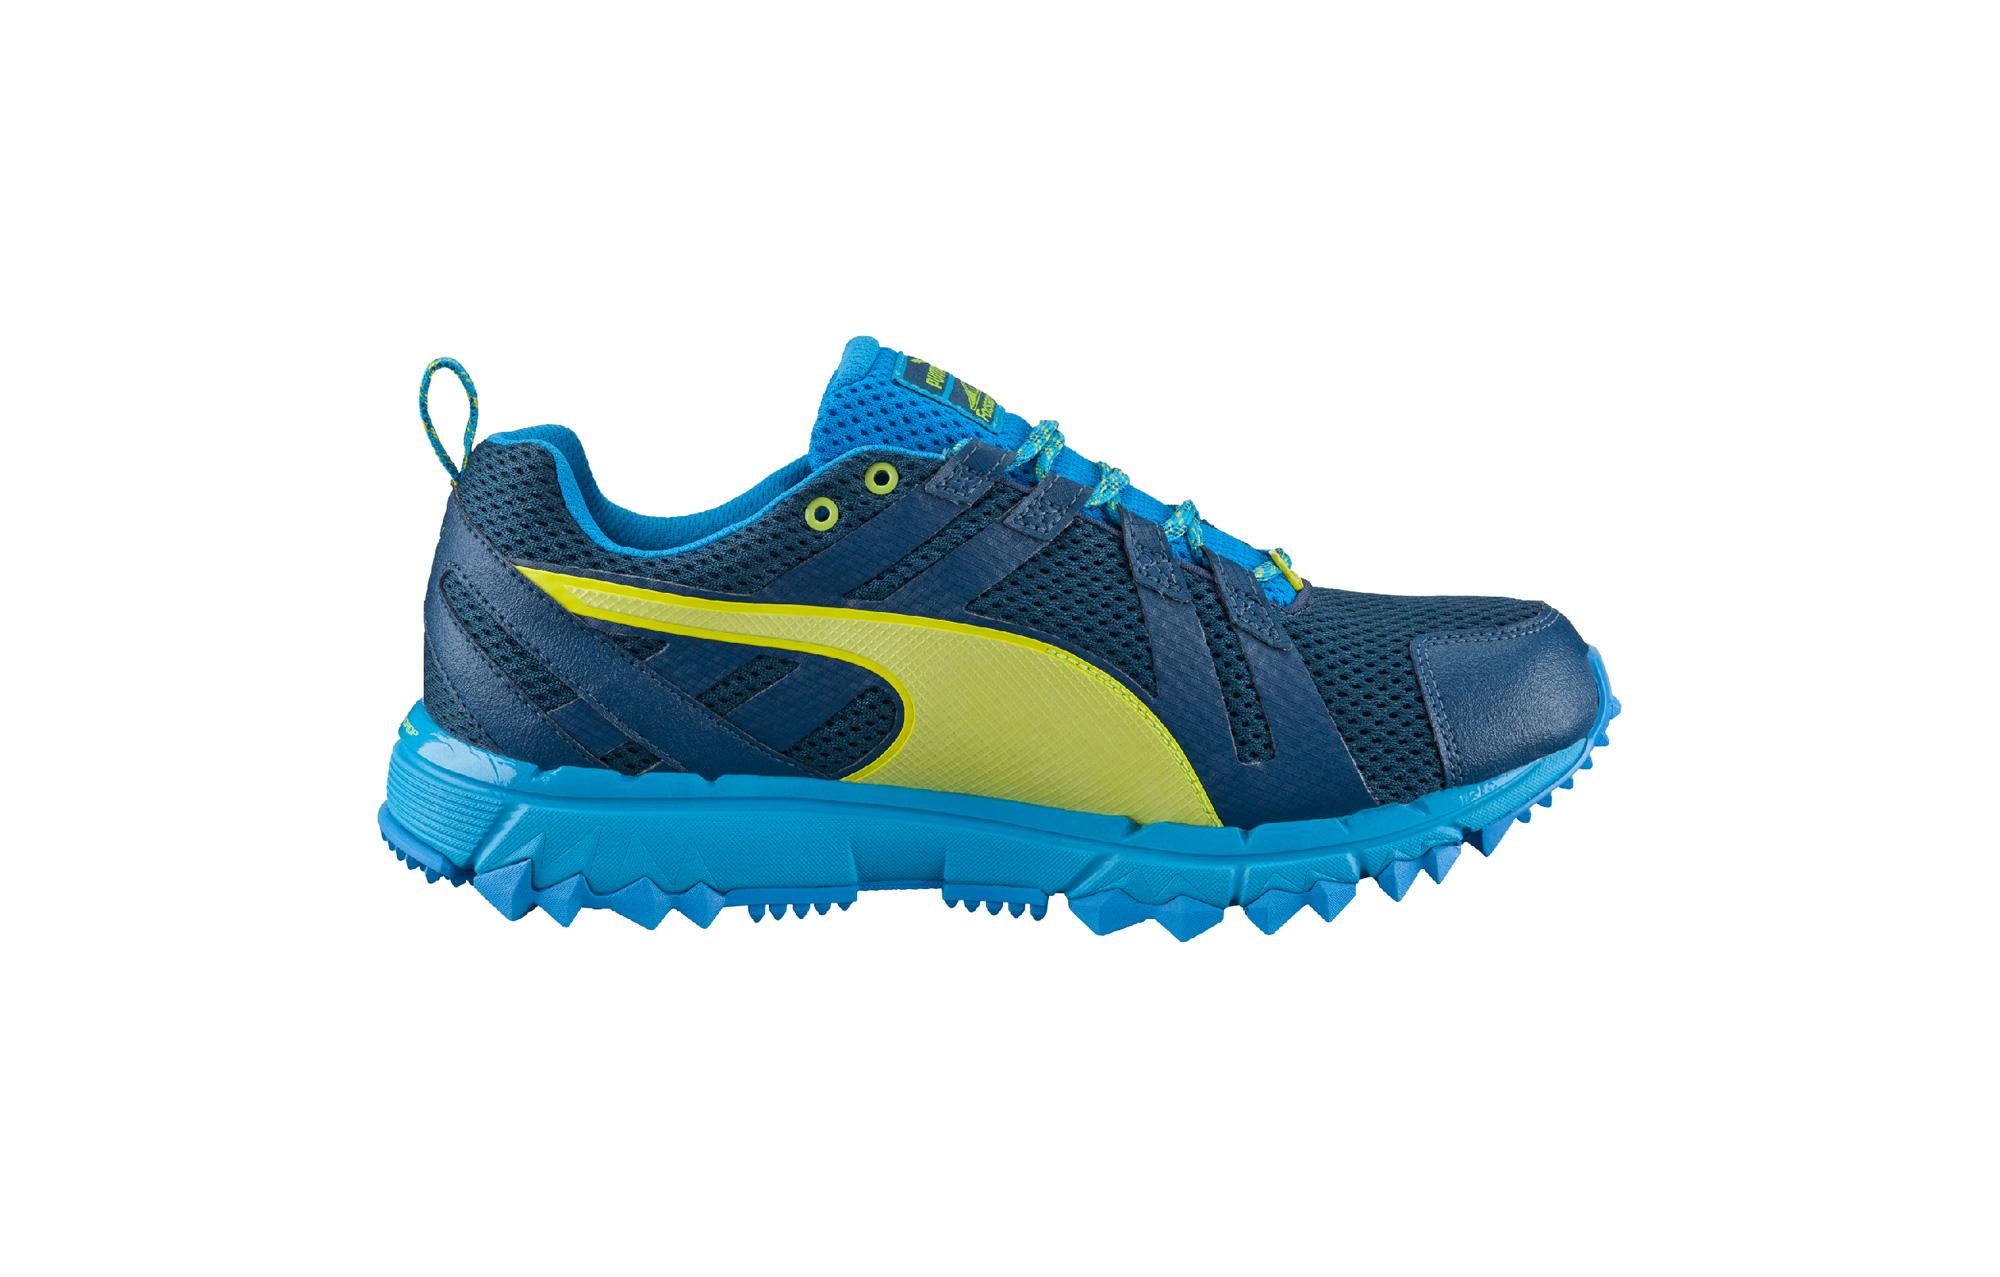 d108bd77df68 PUMA Trail shoes Faas 500 TR v2 GTX® Blue Yellow